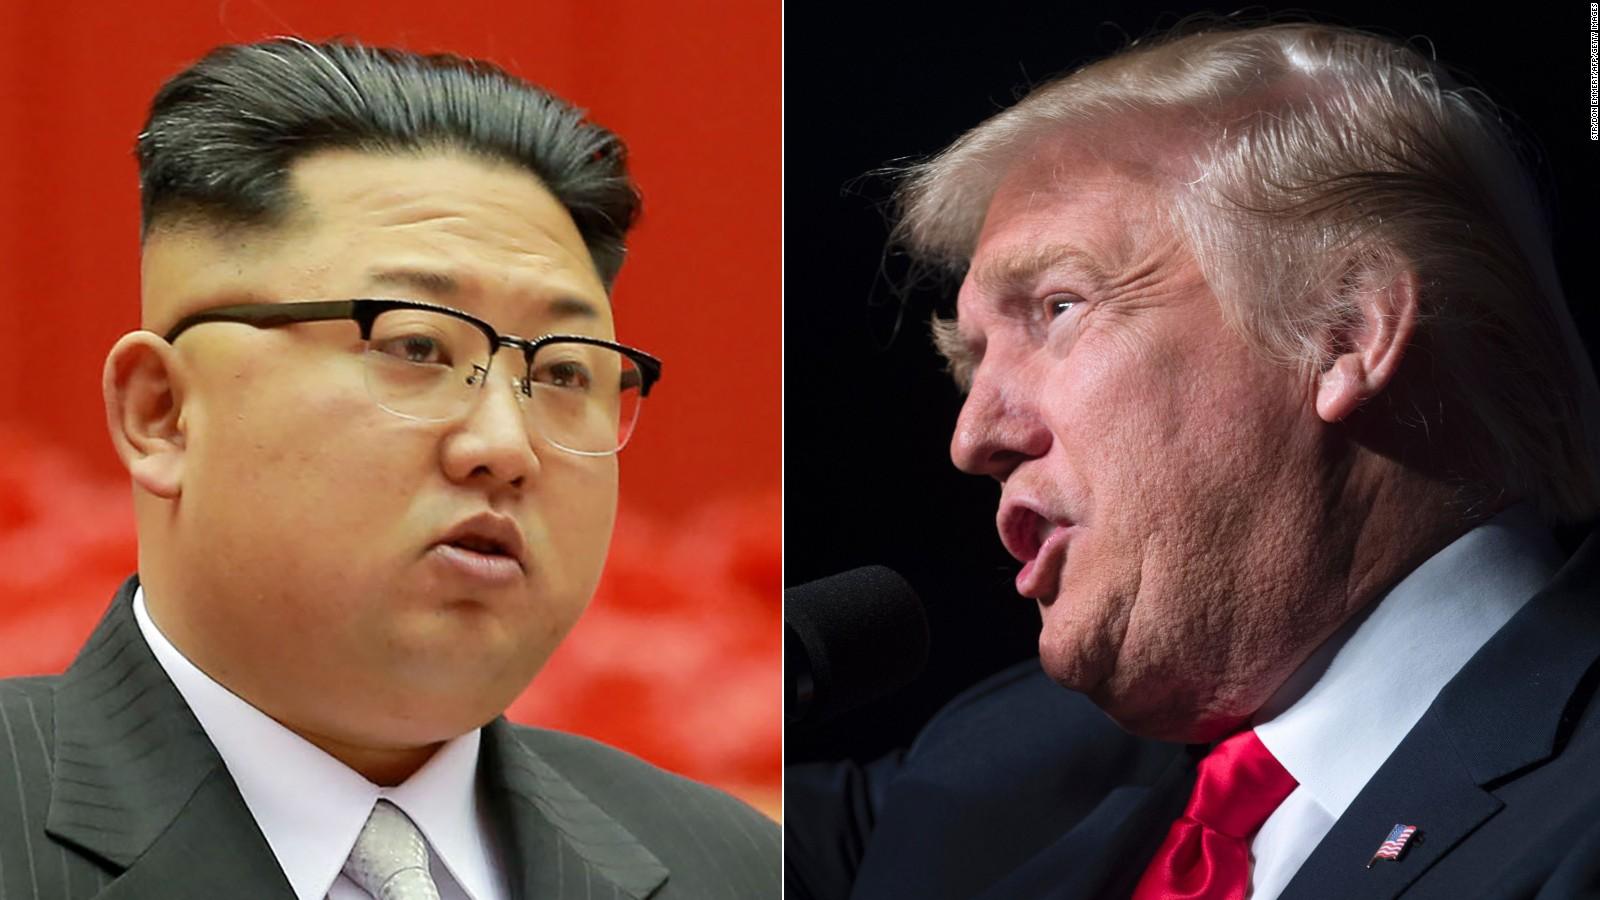 H Β. Κορέα απειλεί ότι θα ματαιώσει τη συνάντηση Κιμ- Τραμπ | to10.gr